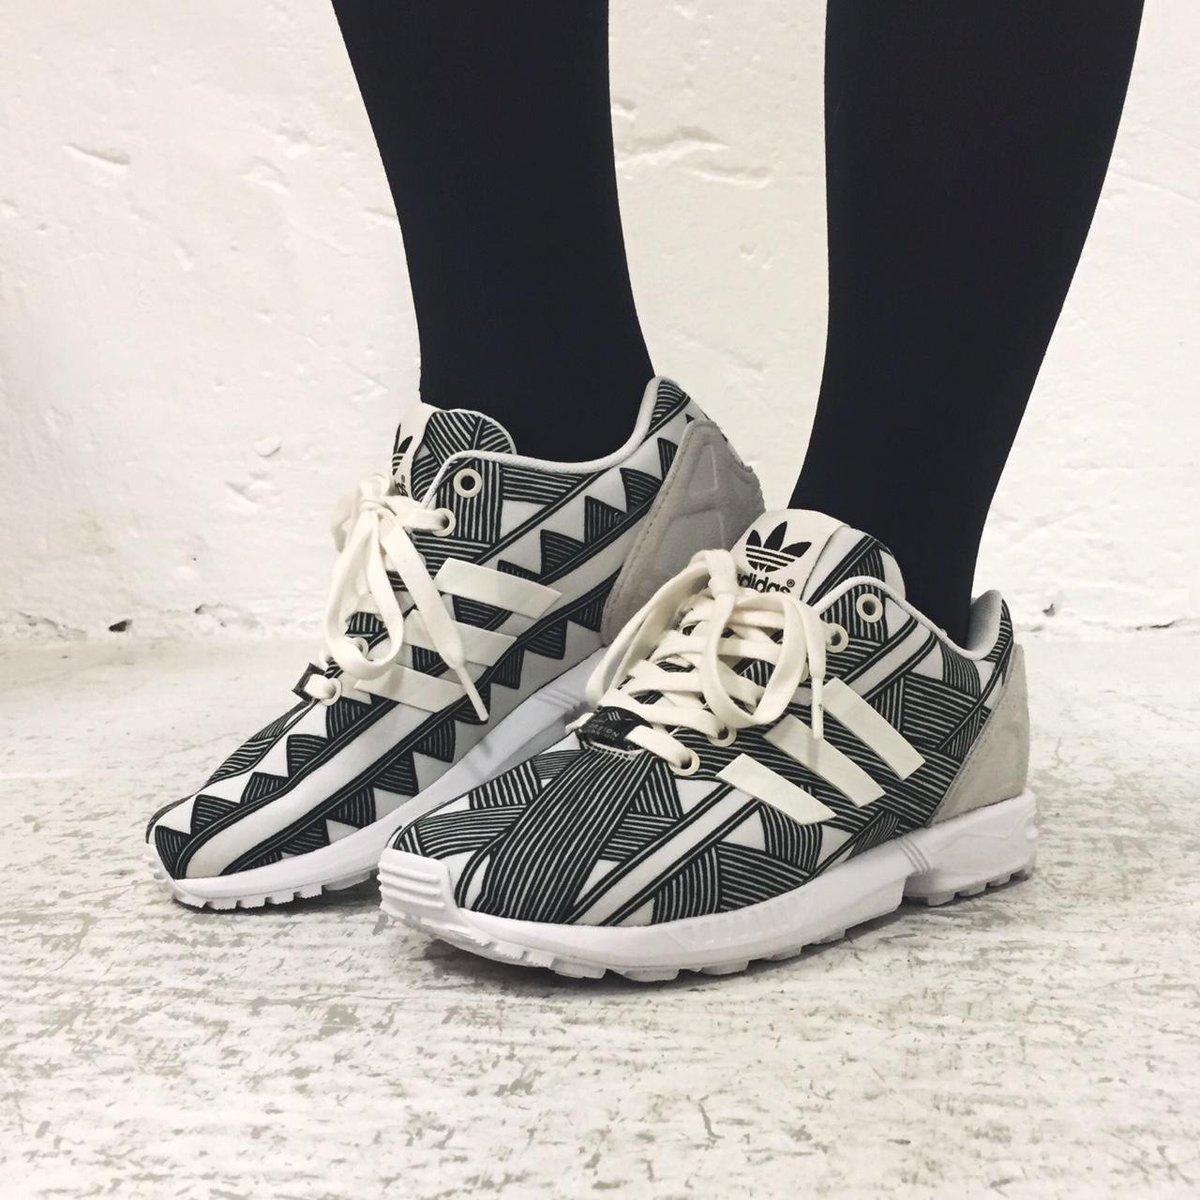 finest selection f9b12 7e095 Sneakersnstuff on Twitter